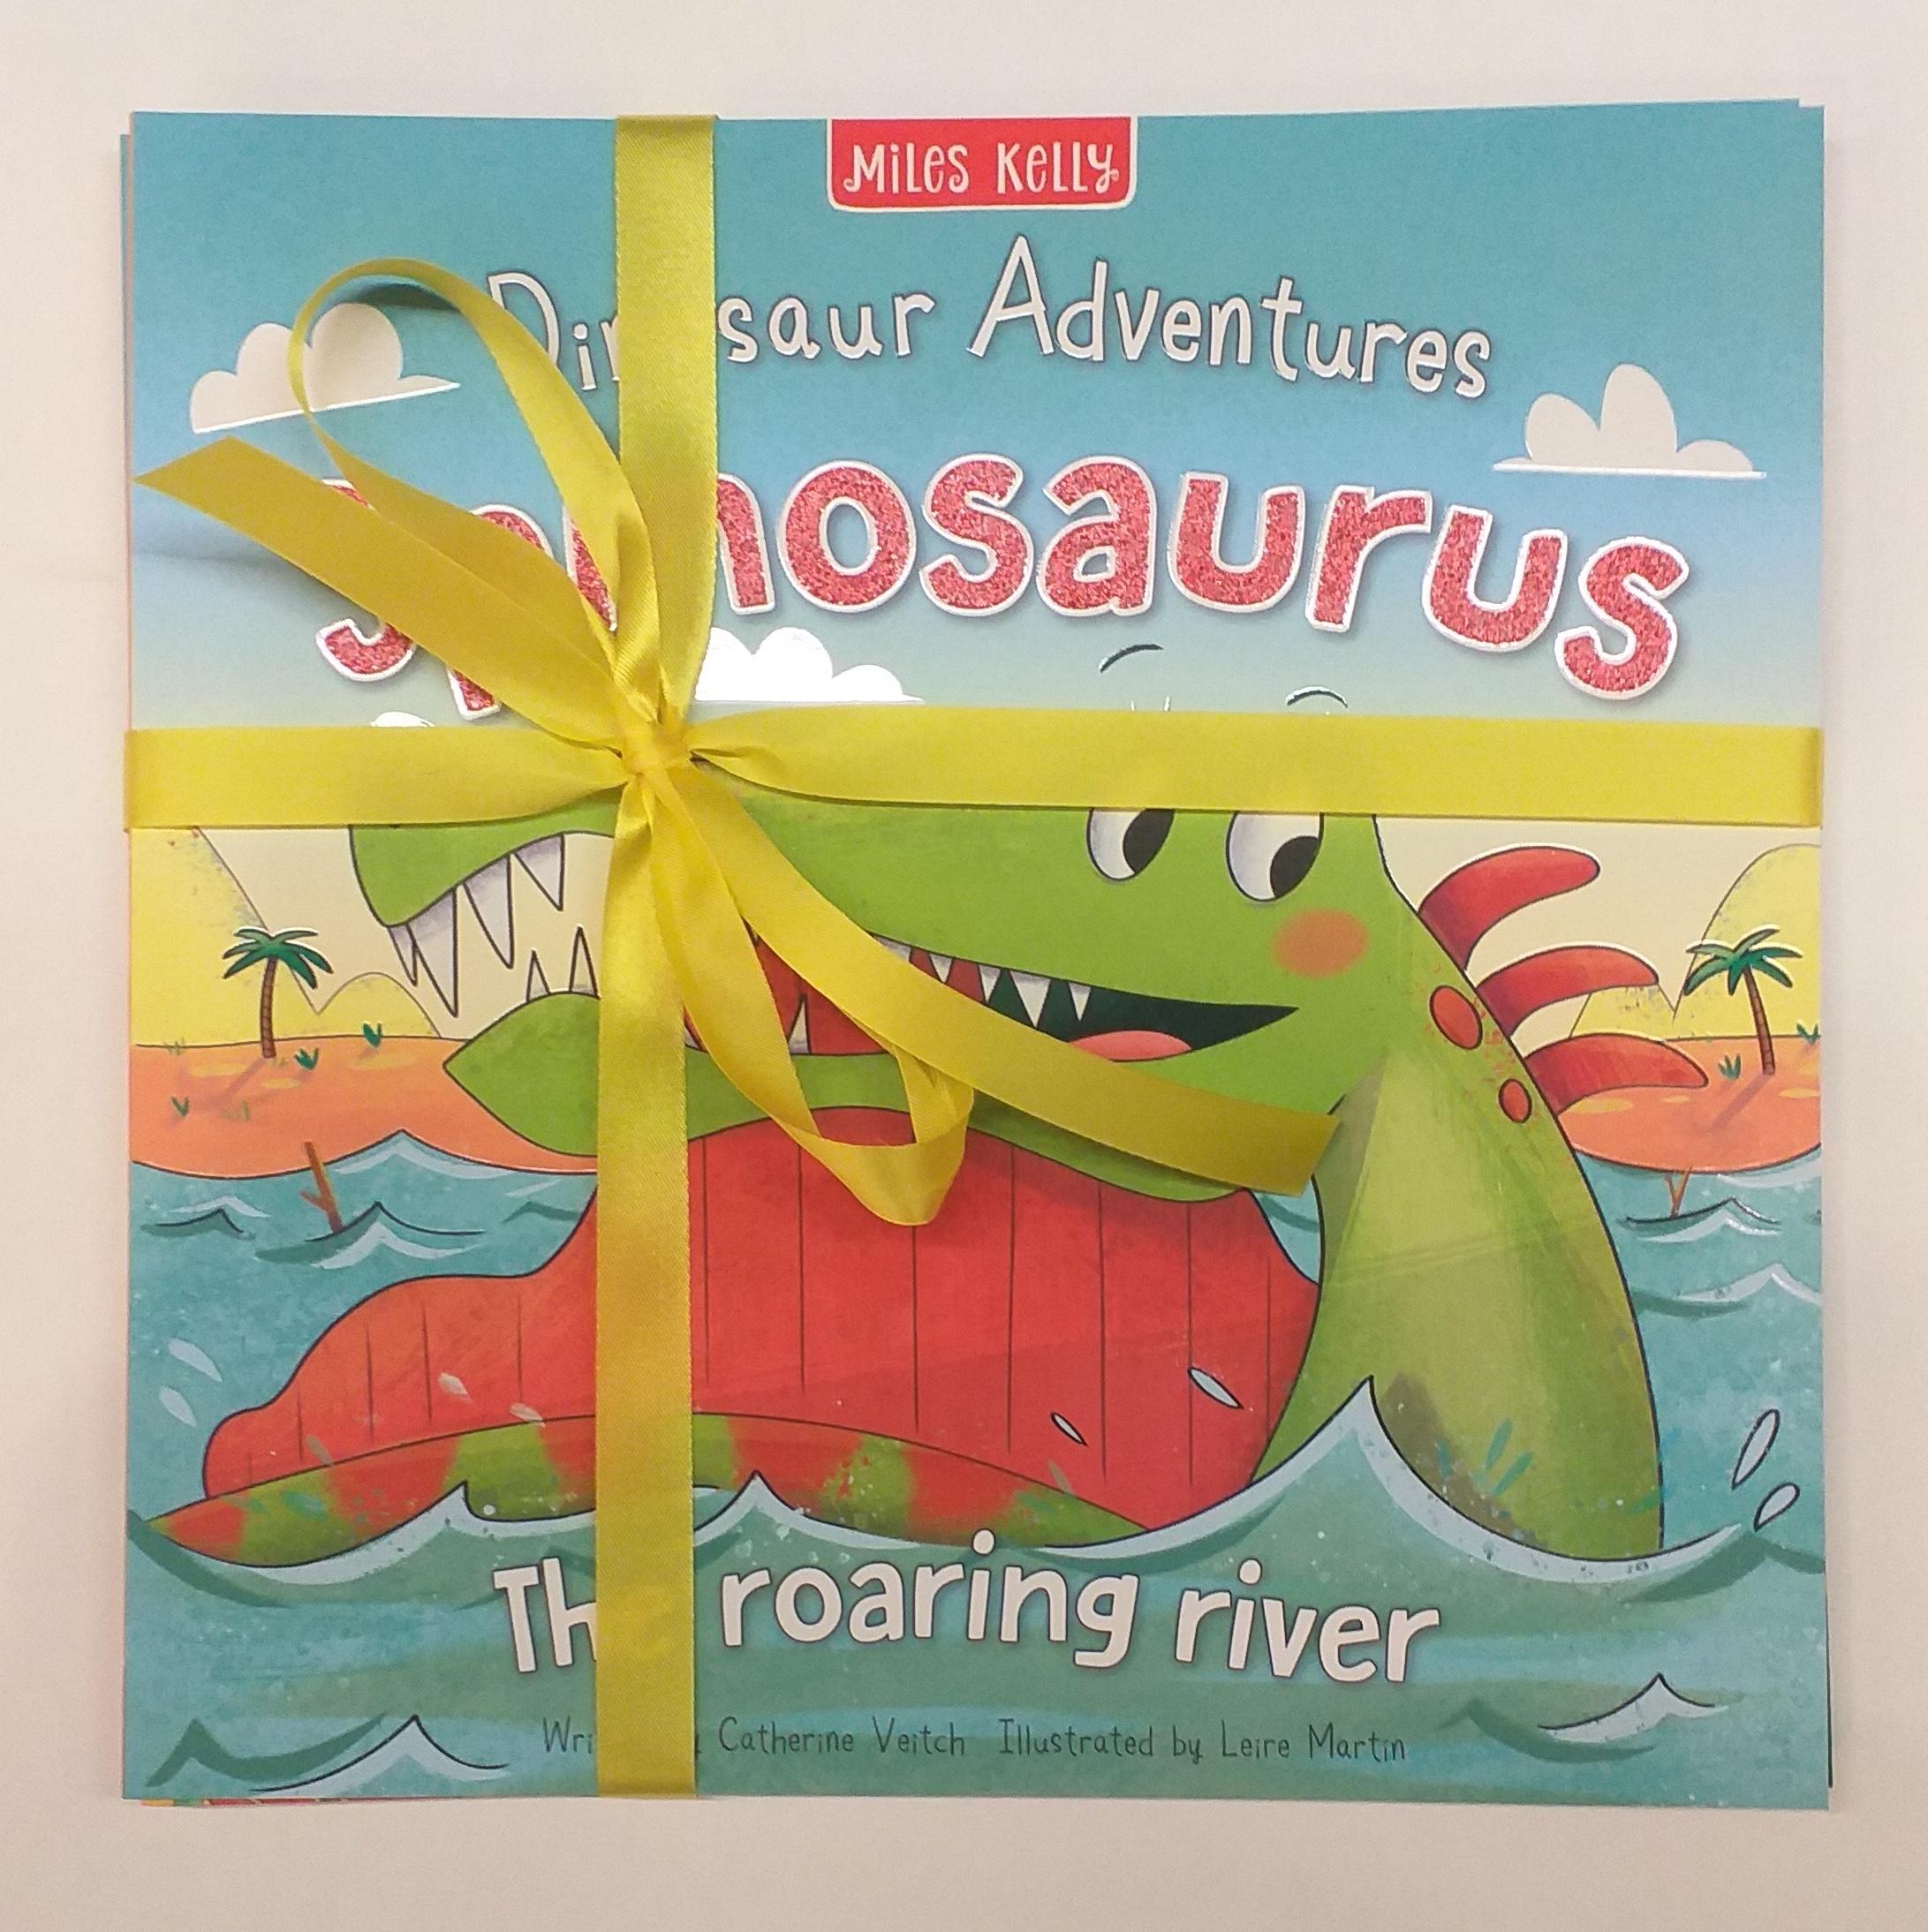 Dinosaur Bundle - 4 Picture Books for €9.99